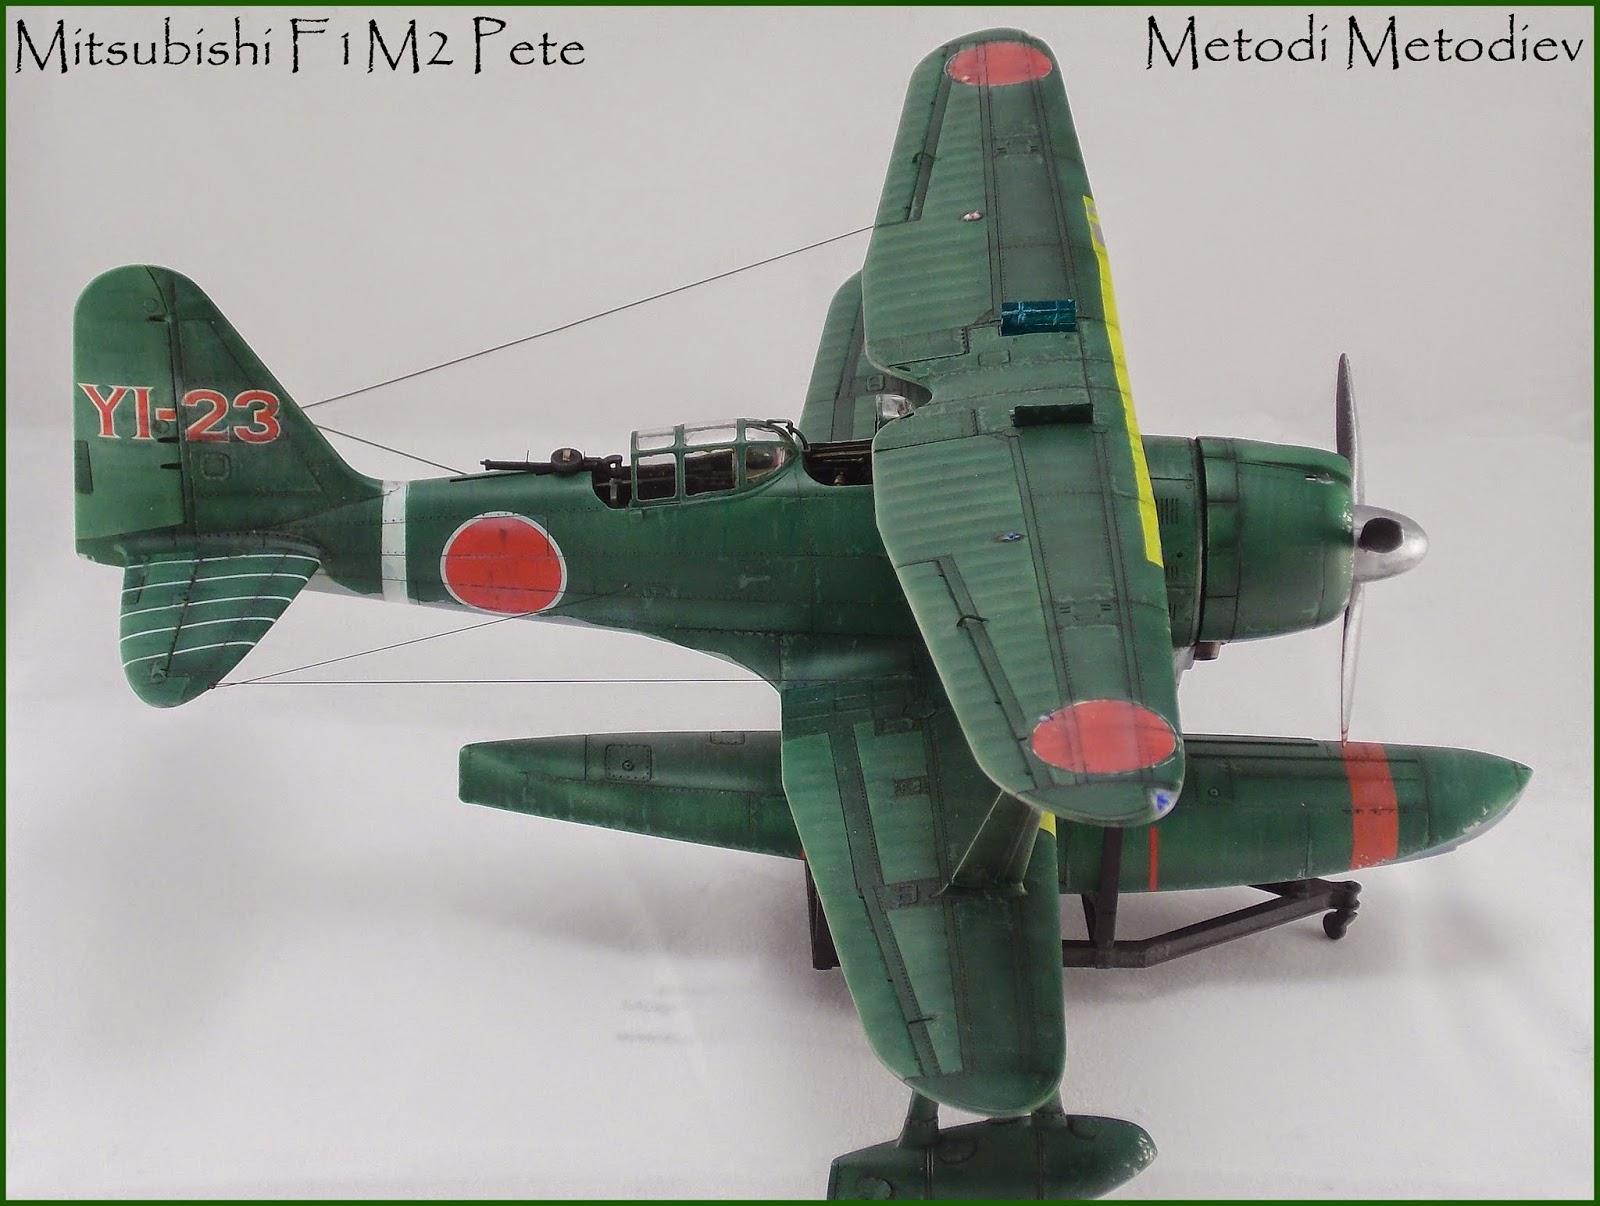 IJN Mitsubishy F1M2 Pete - Hasegawa 1:48 scale model